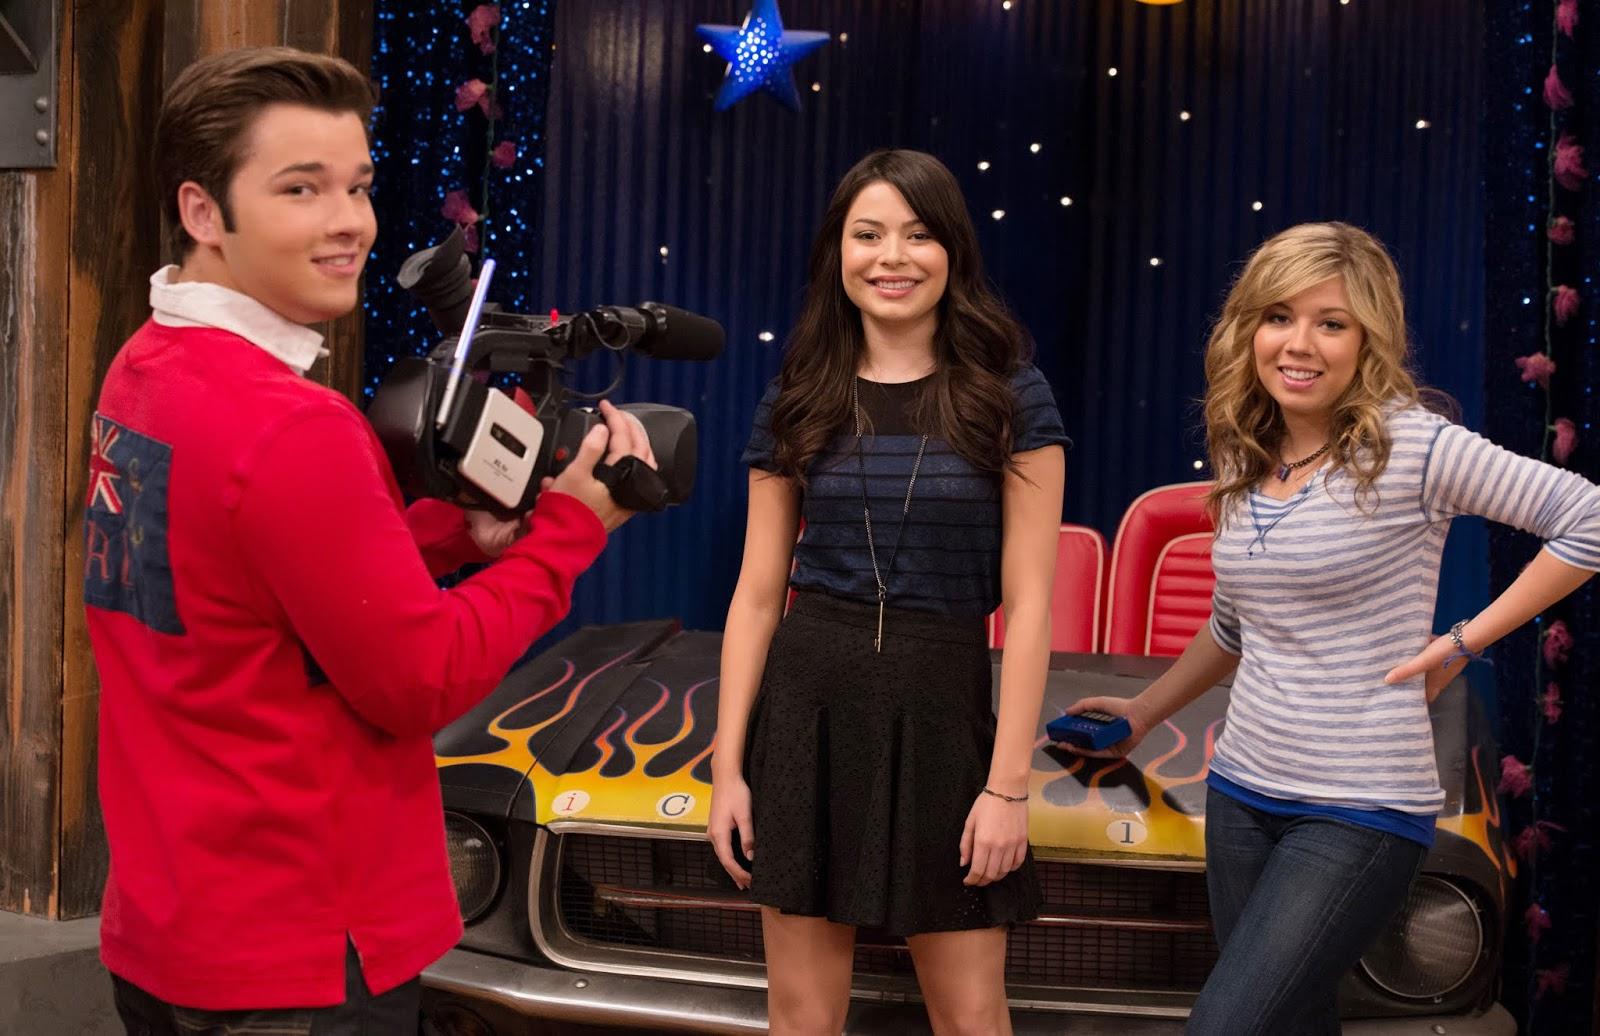 NickALive!: iCarly and the Mistletoe | iCarly | Nickelodeon